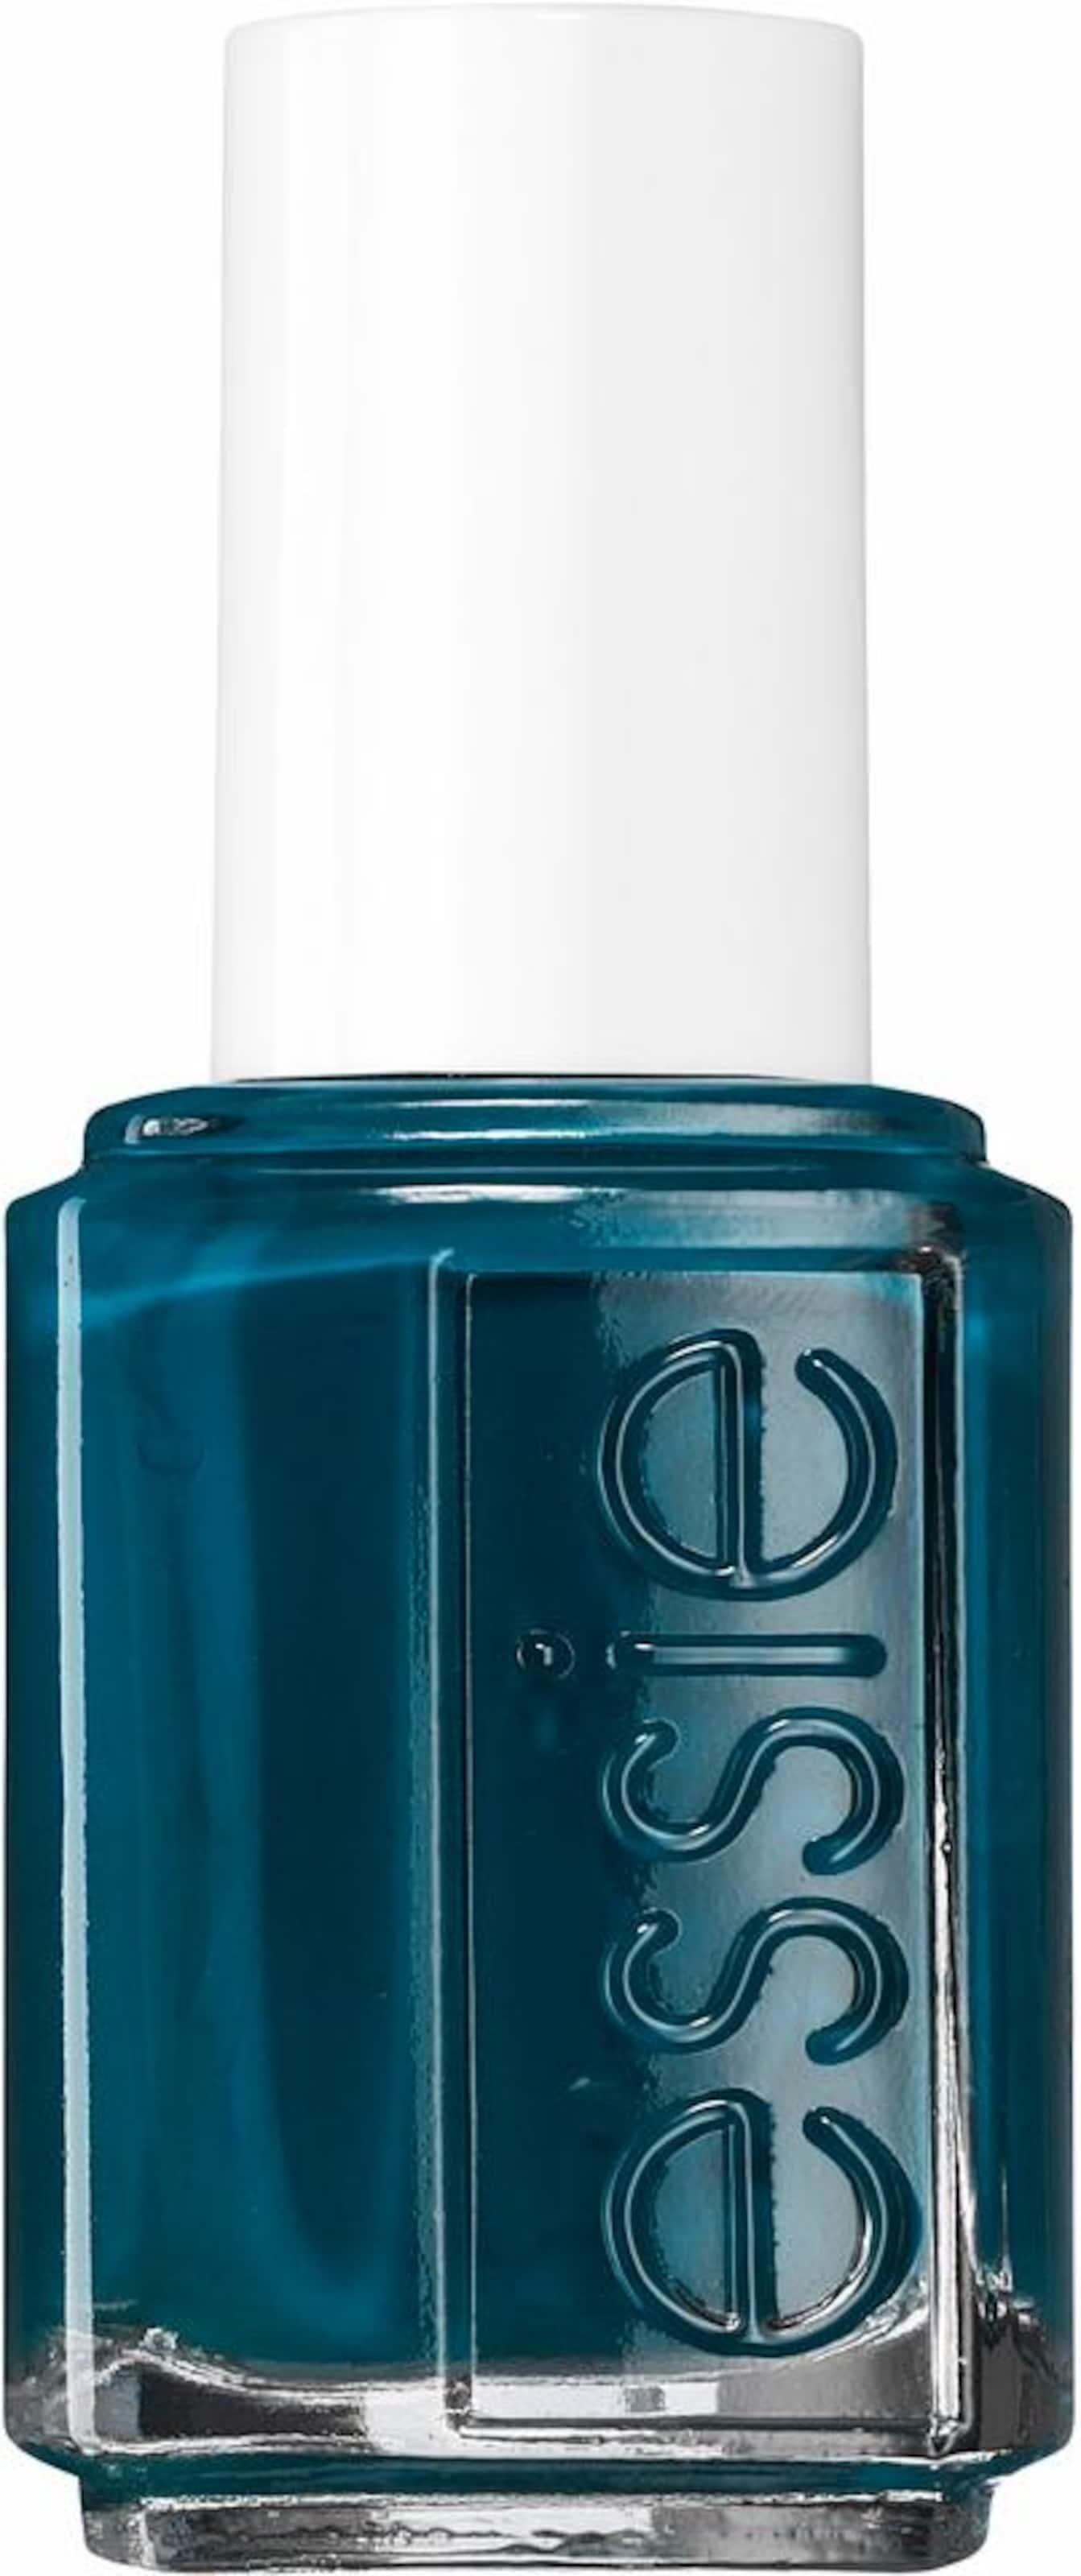 essie Nagellack 'Grün & Blau Töne' Billig Verkauf Rabatte NlyD7L8